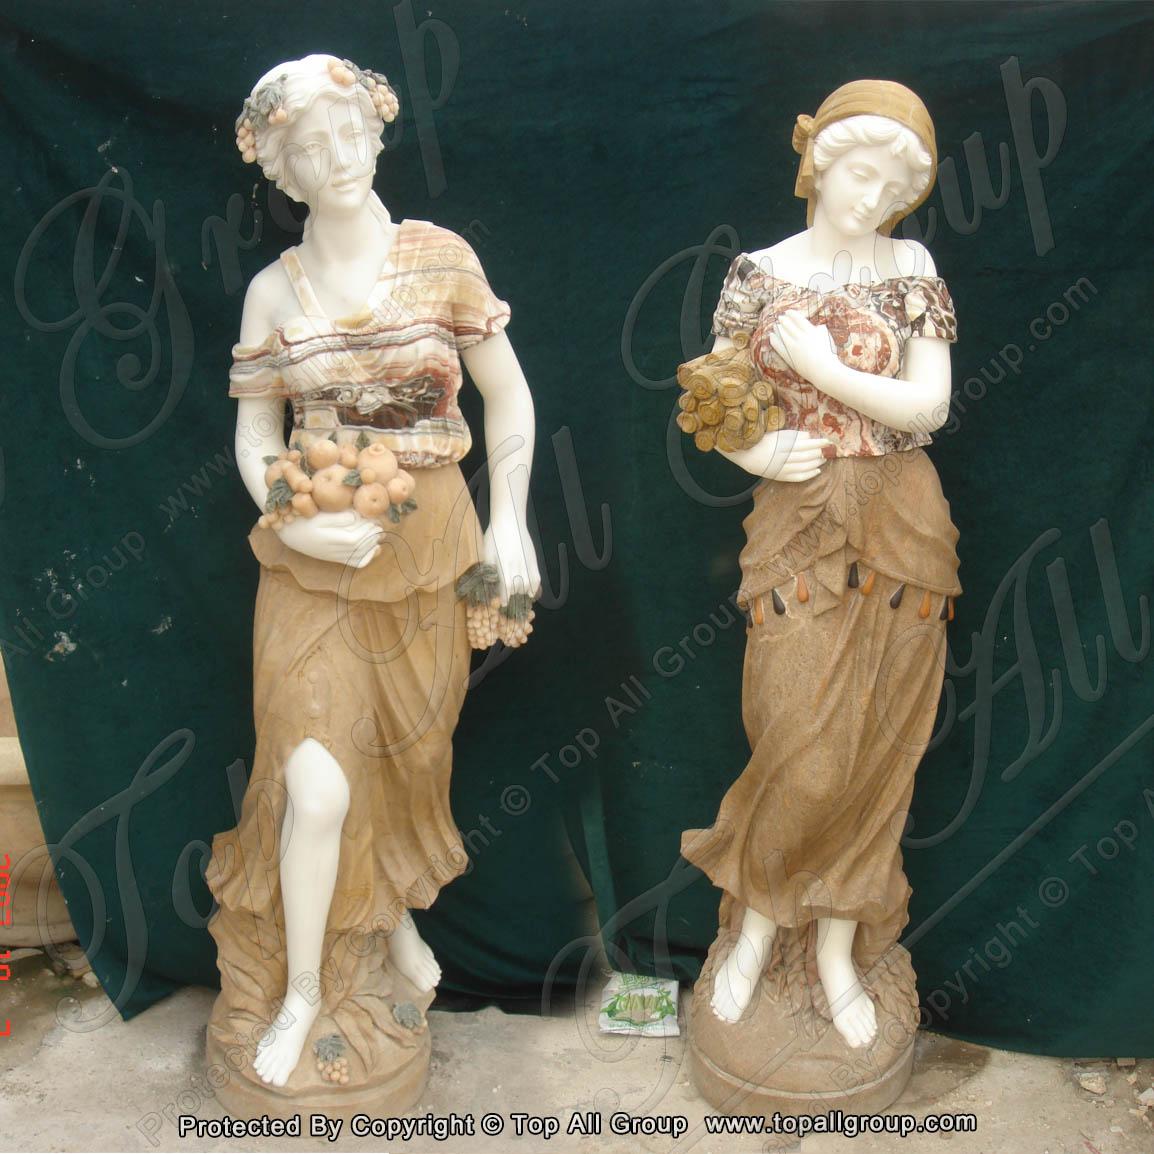 Colorful marble women four season statue for garden